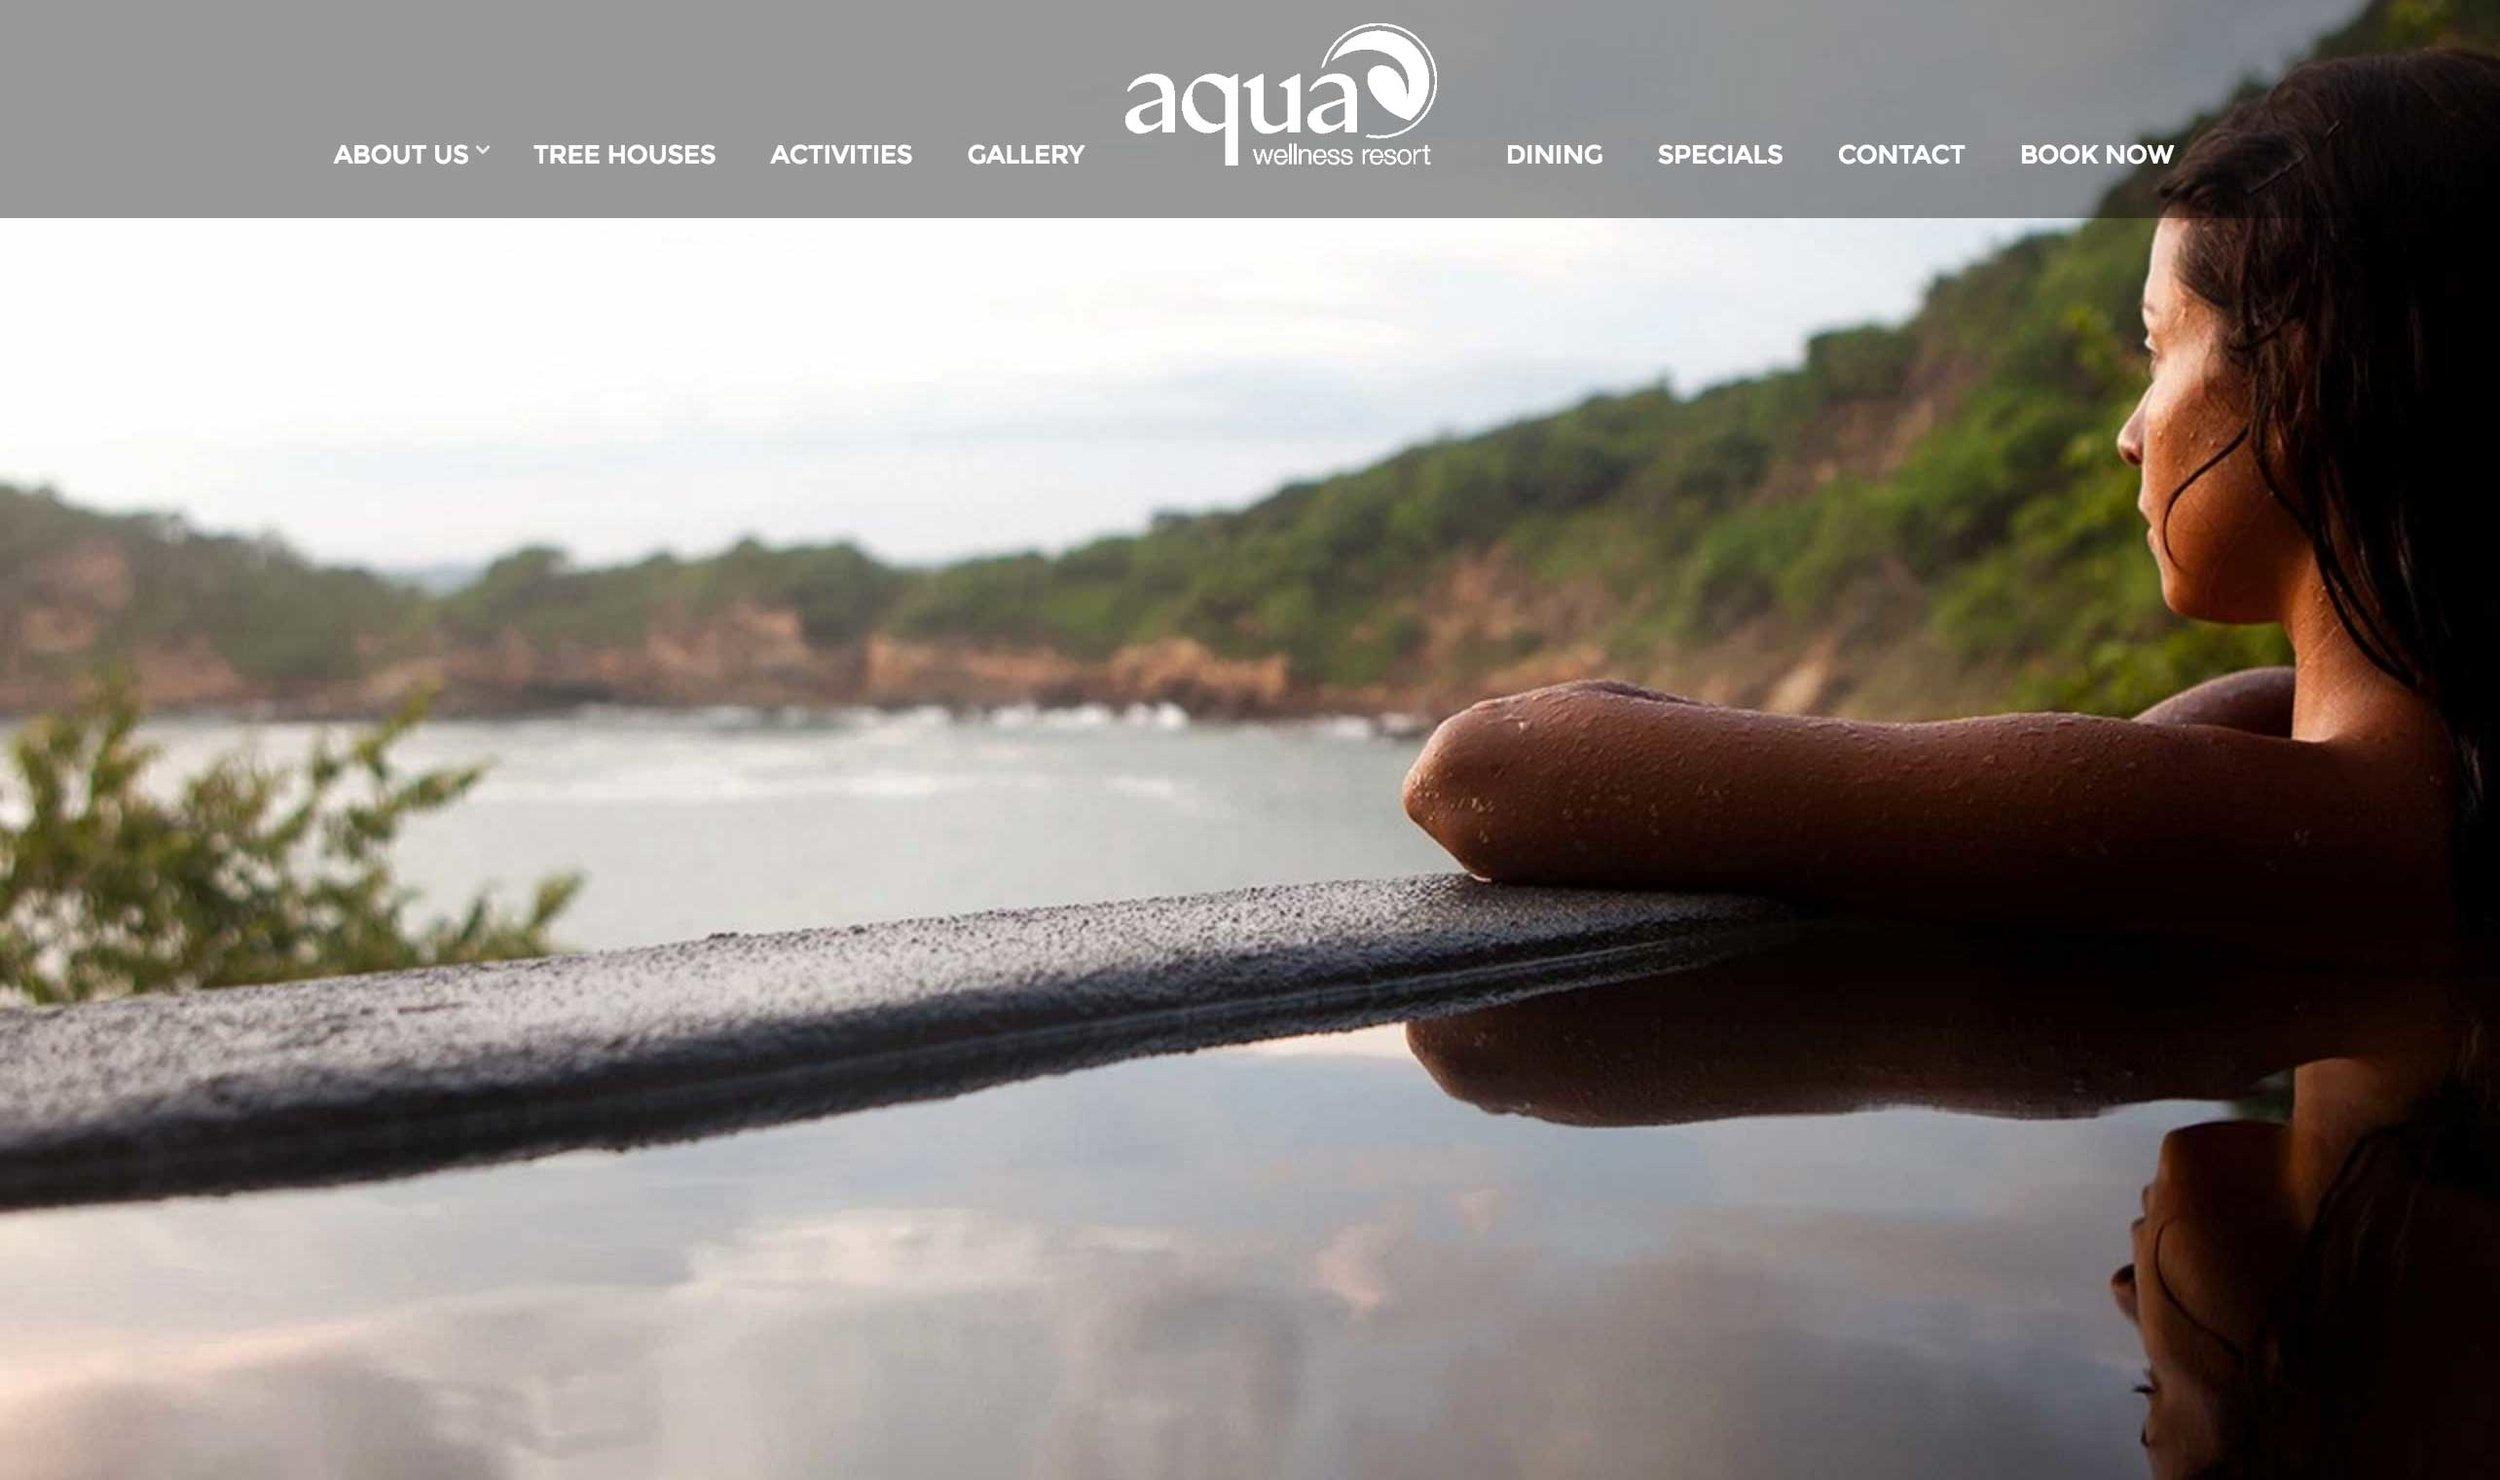 aqua-wellness.jpg